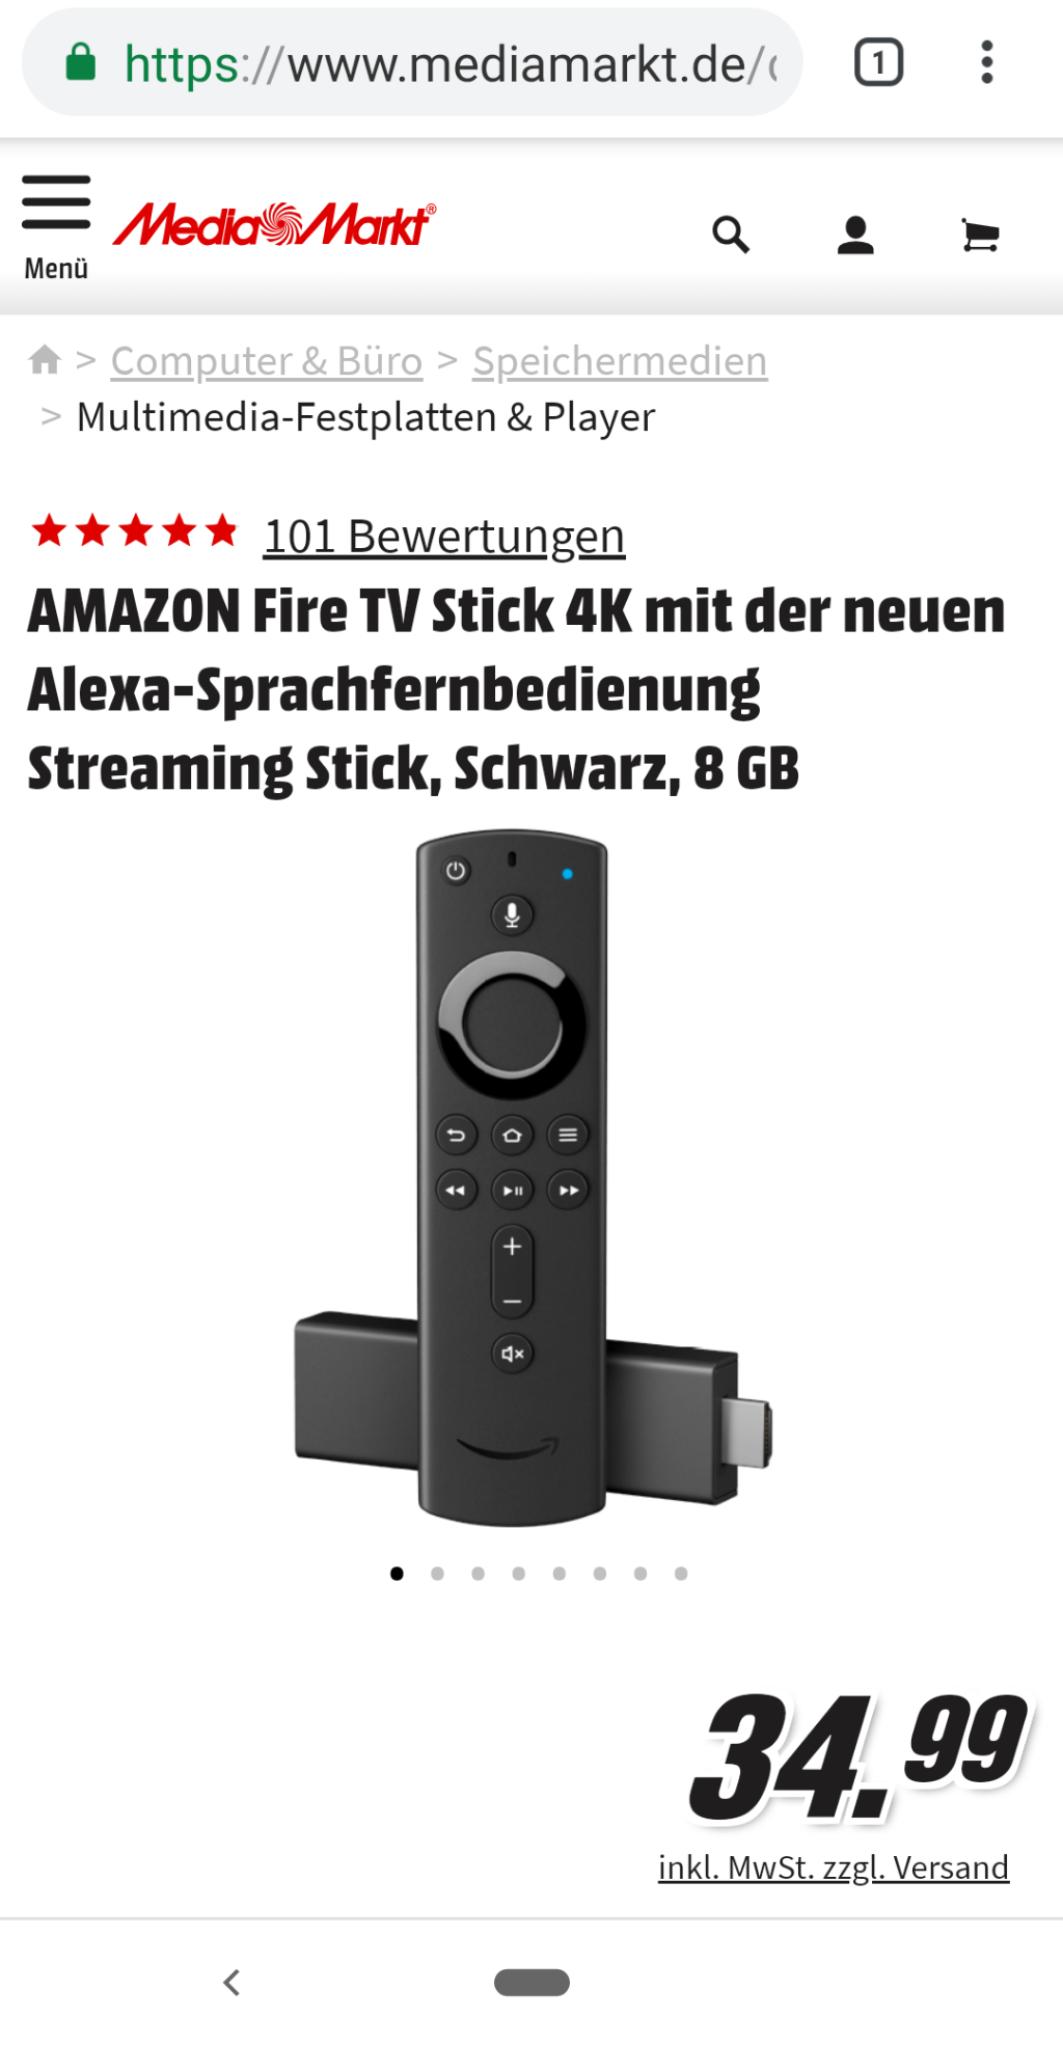 Amazon Fire TV Stick 4K 34,99€ Media Markt